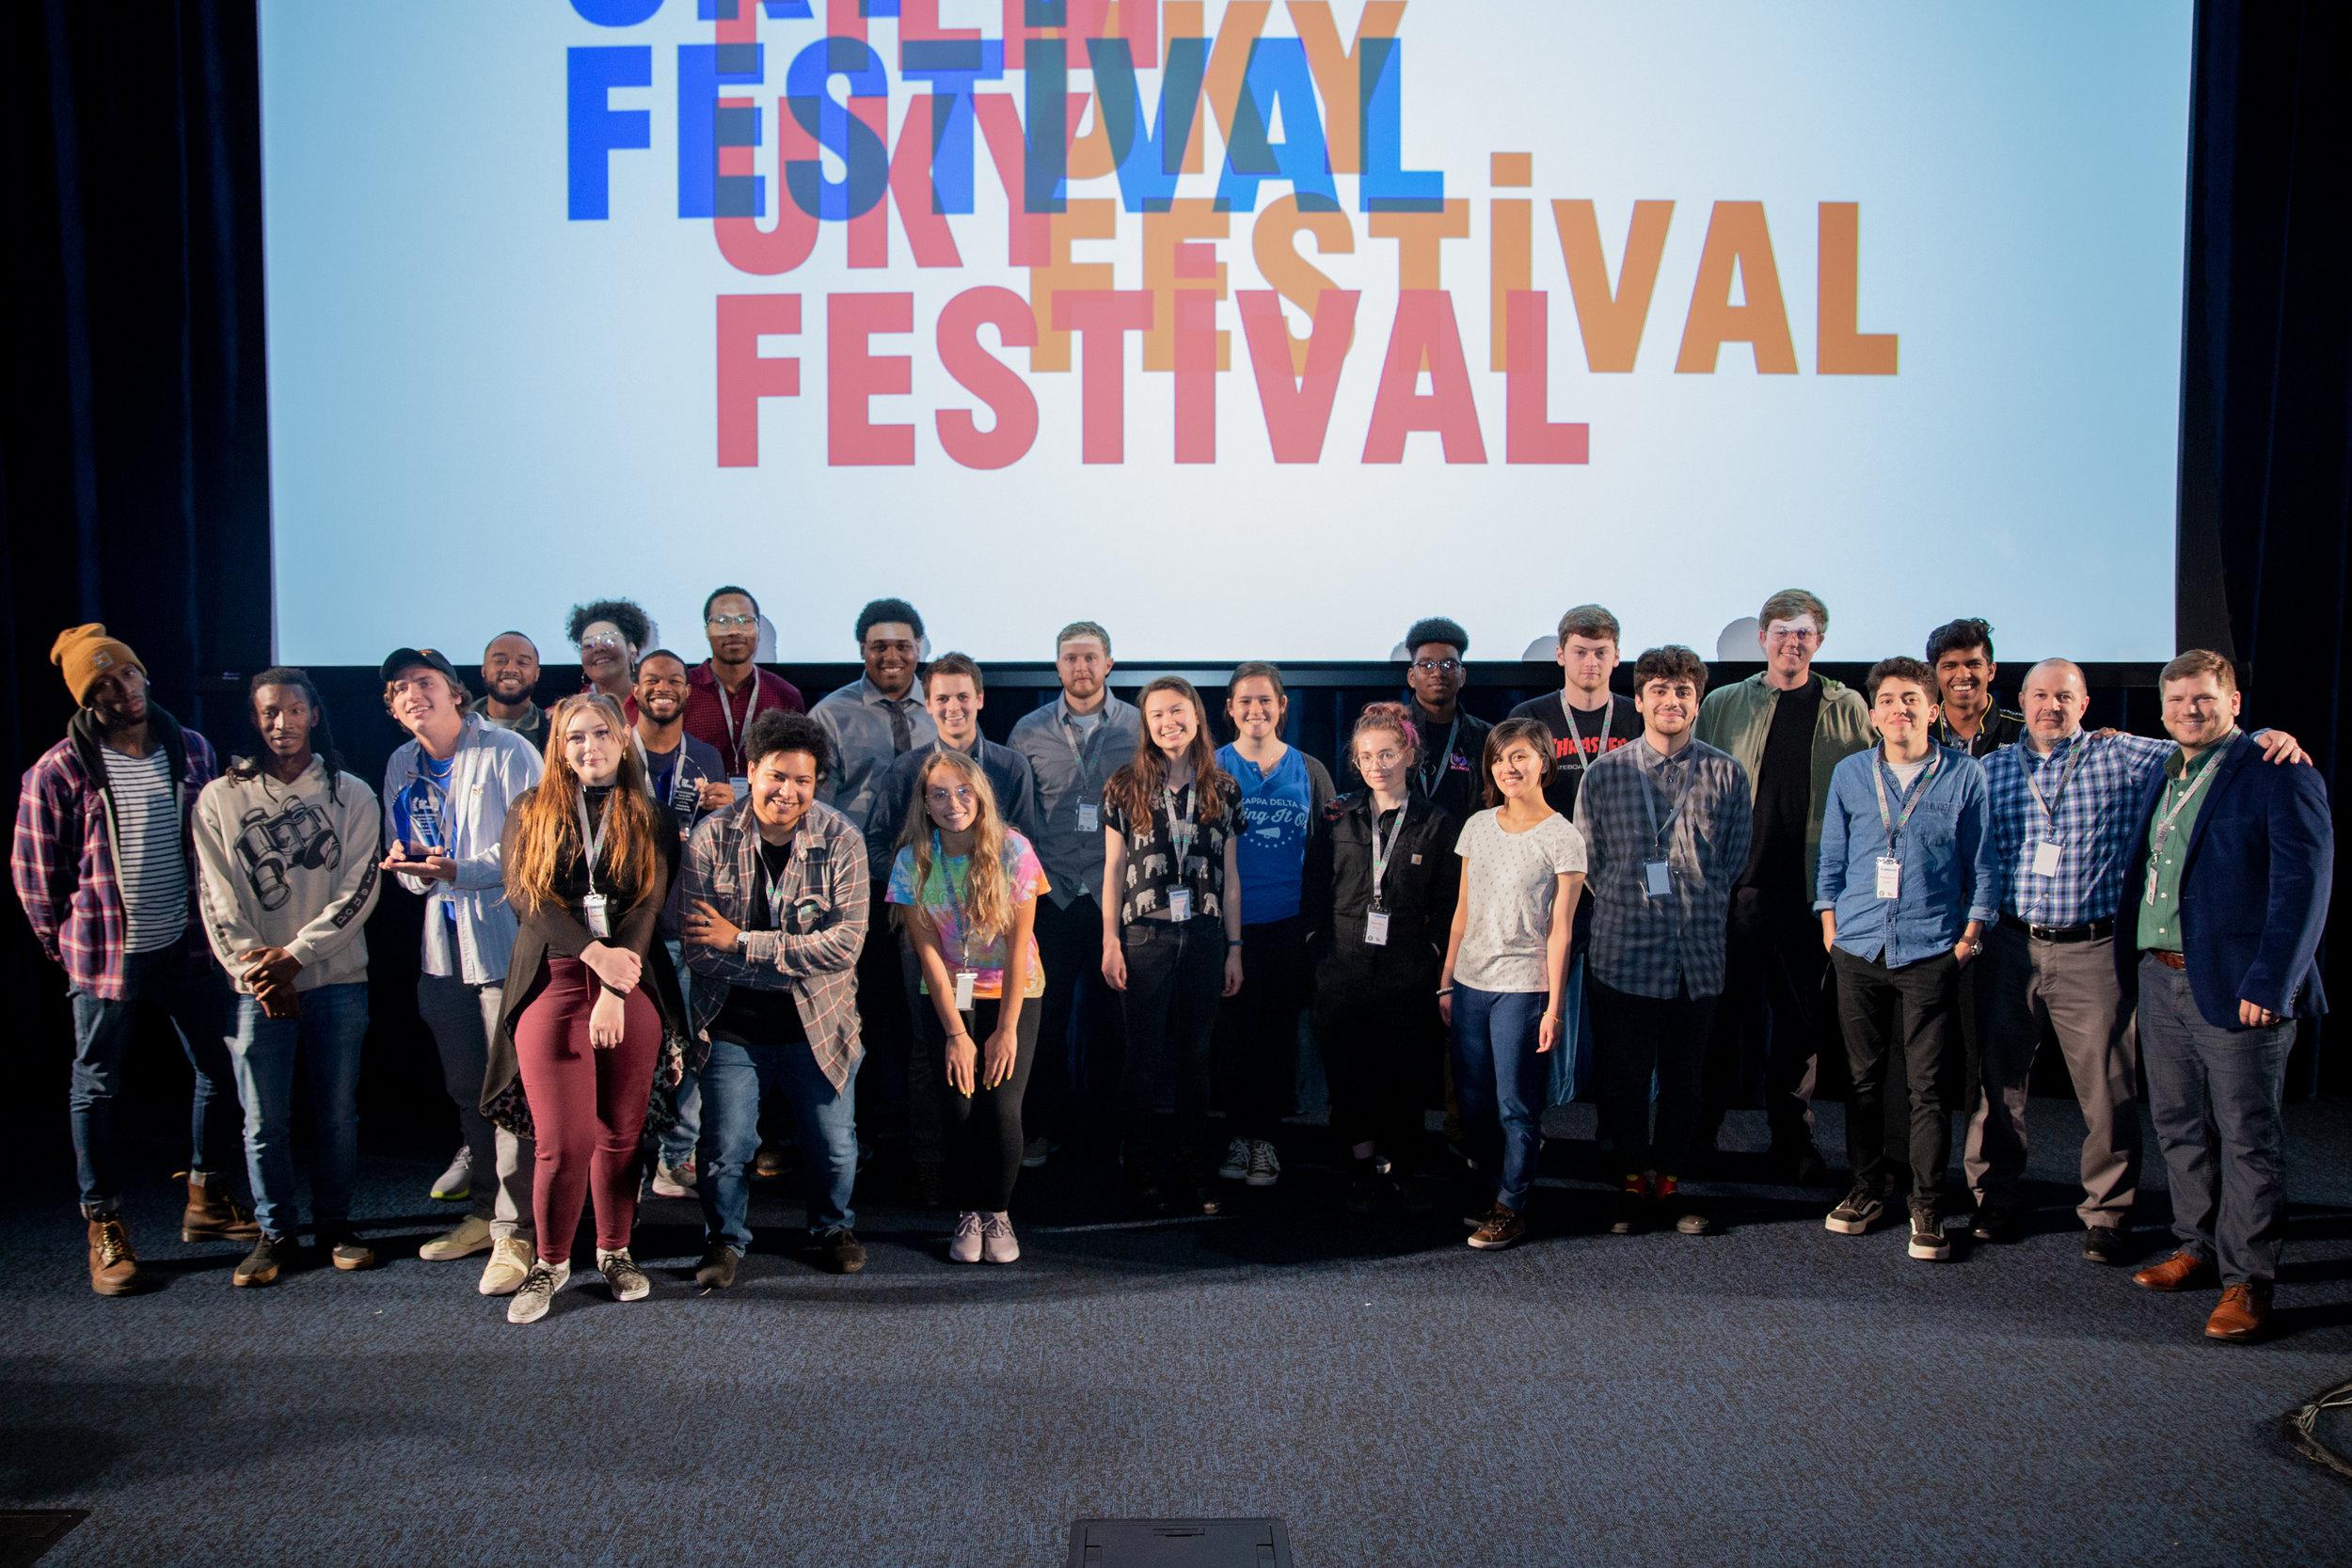 UKY Film Festival - Spring 2019 Filmmakers!